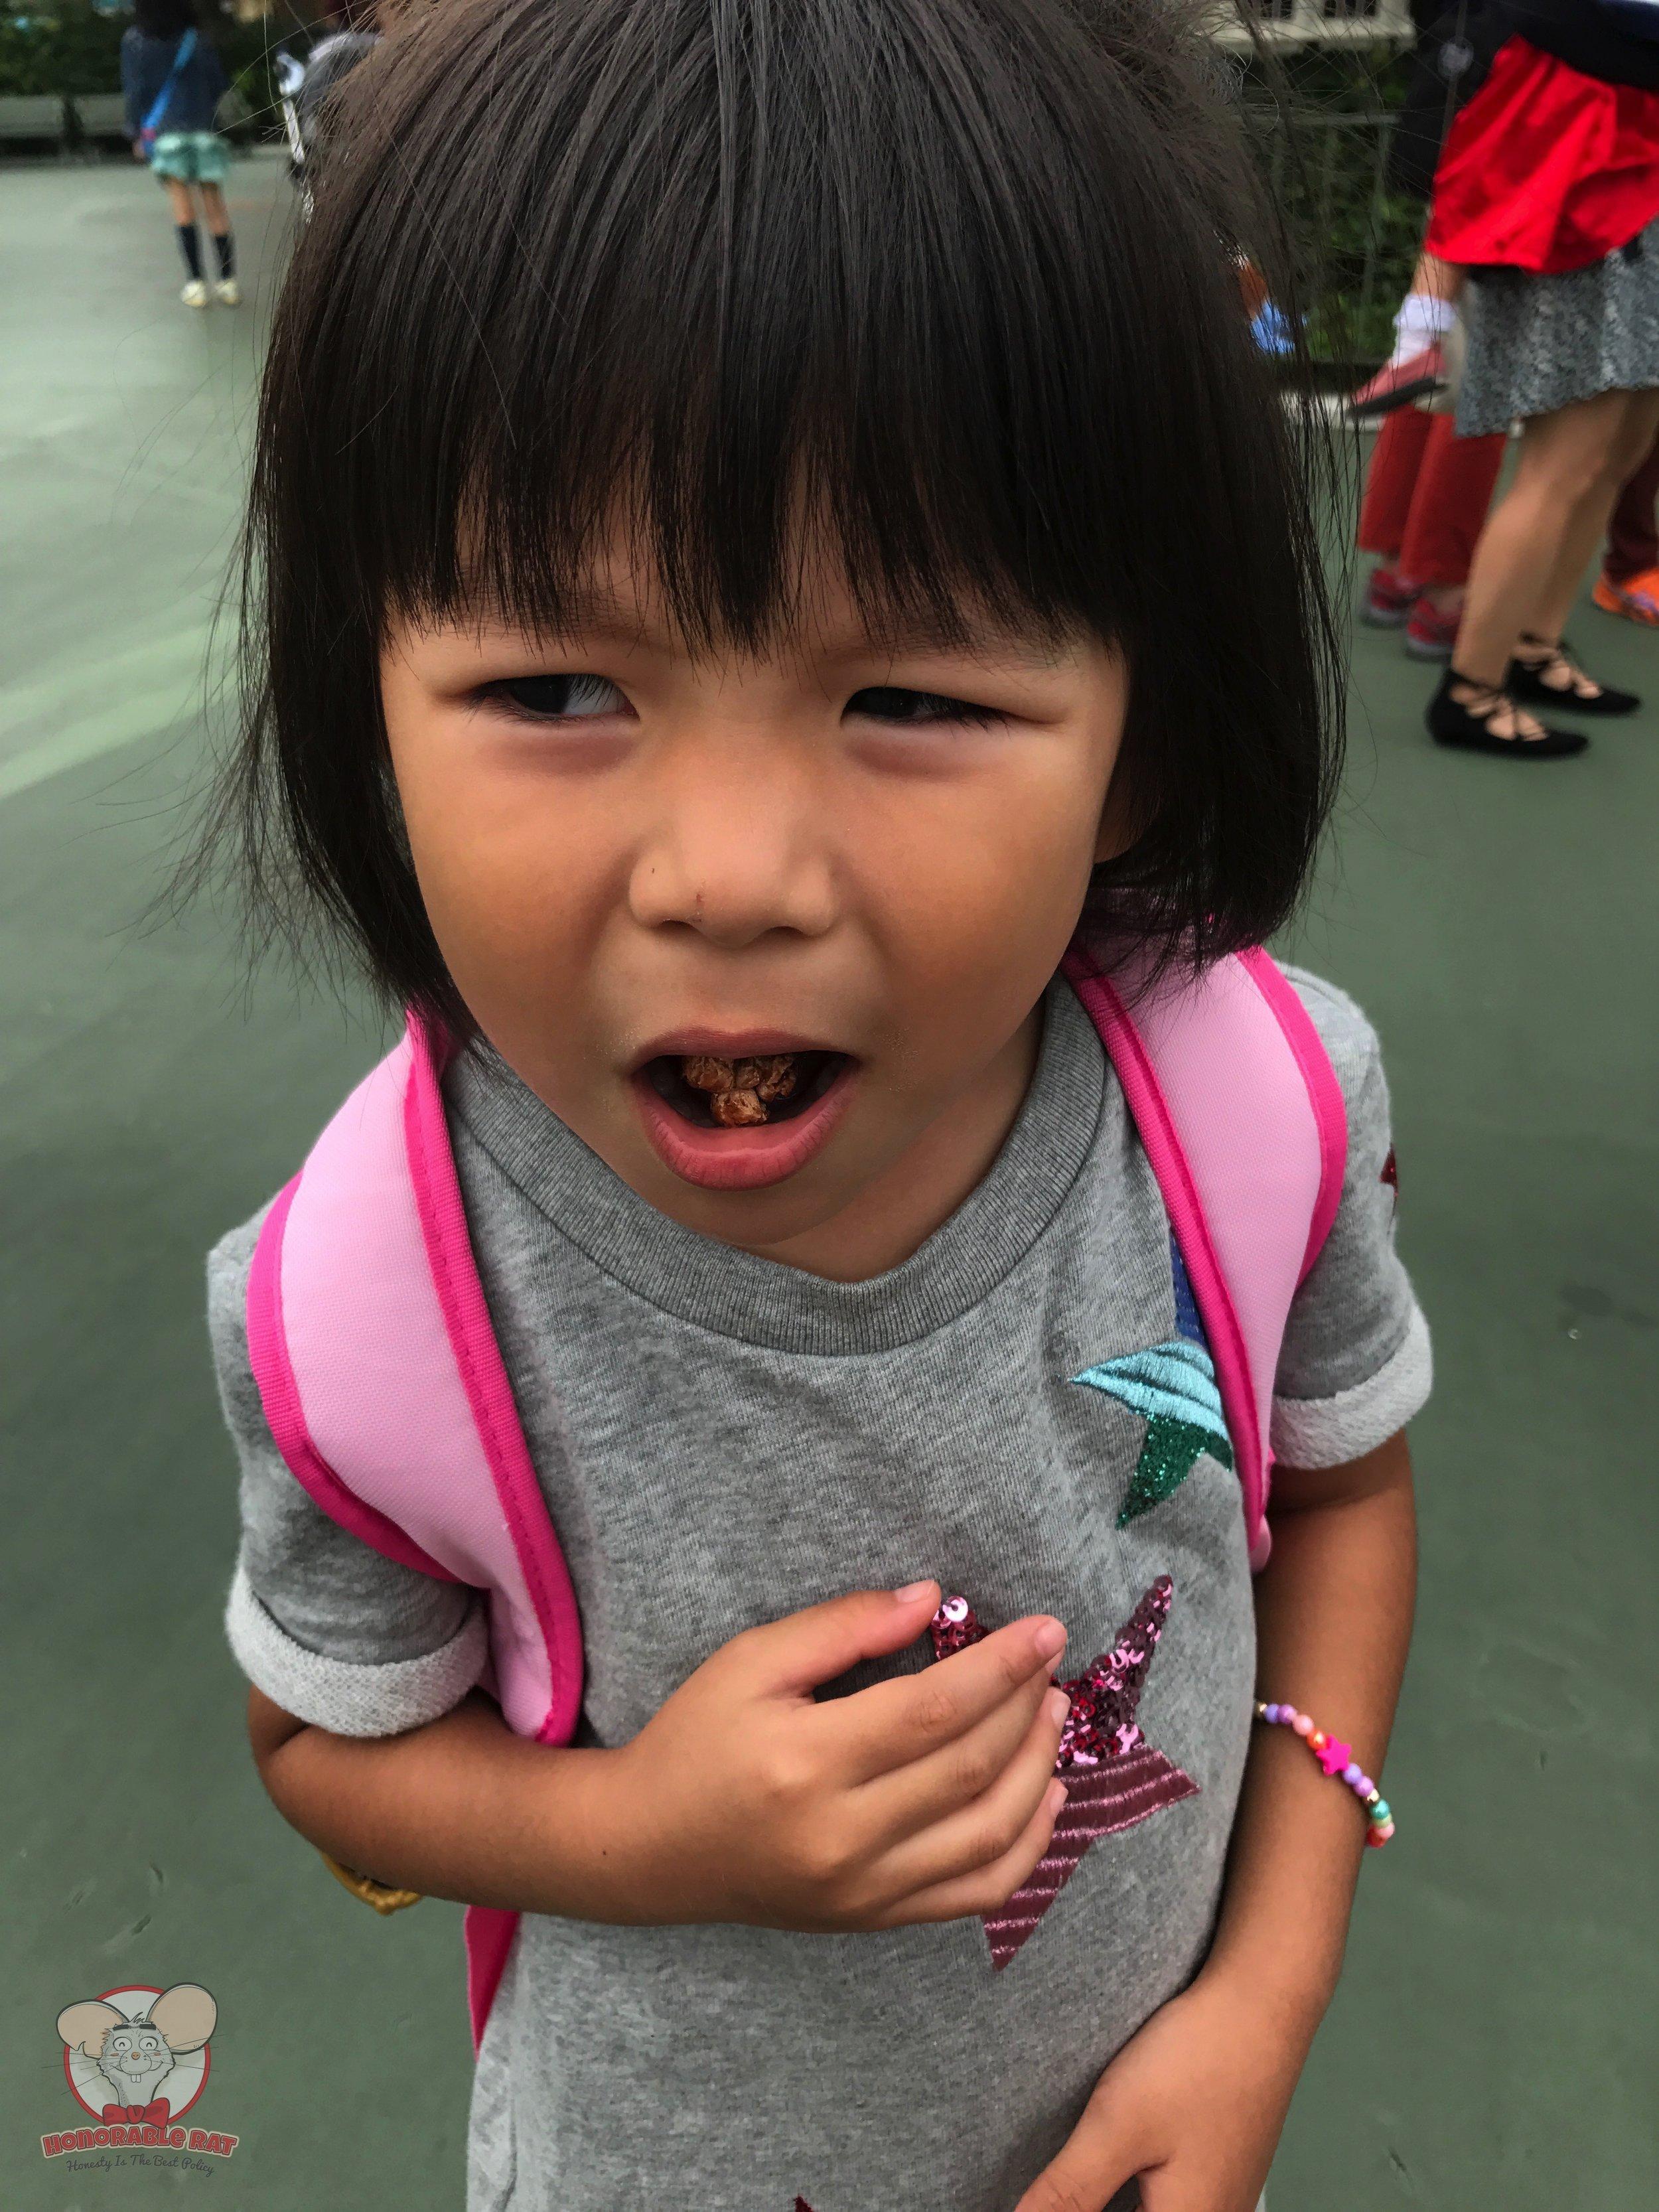 Little Mahina didn't enjoy the Milk Chocolate Popcorn at all